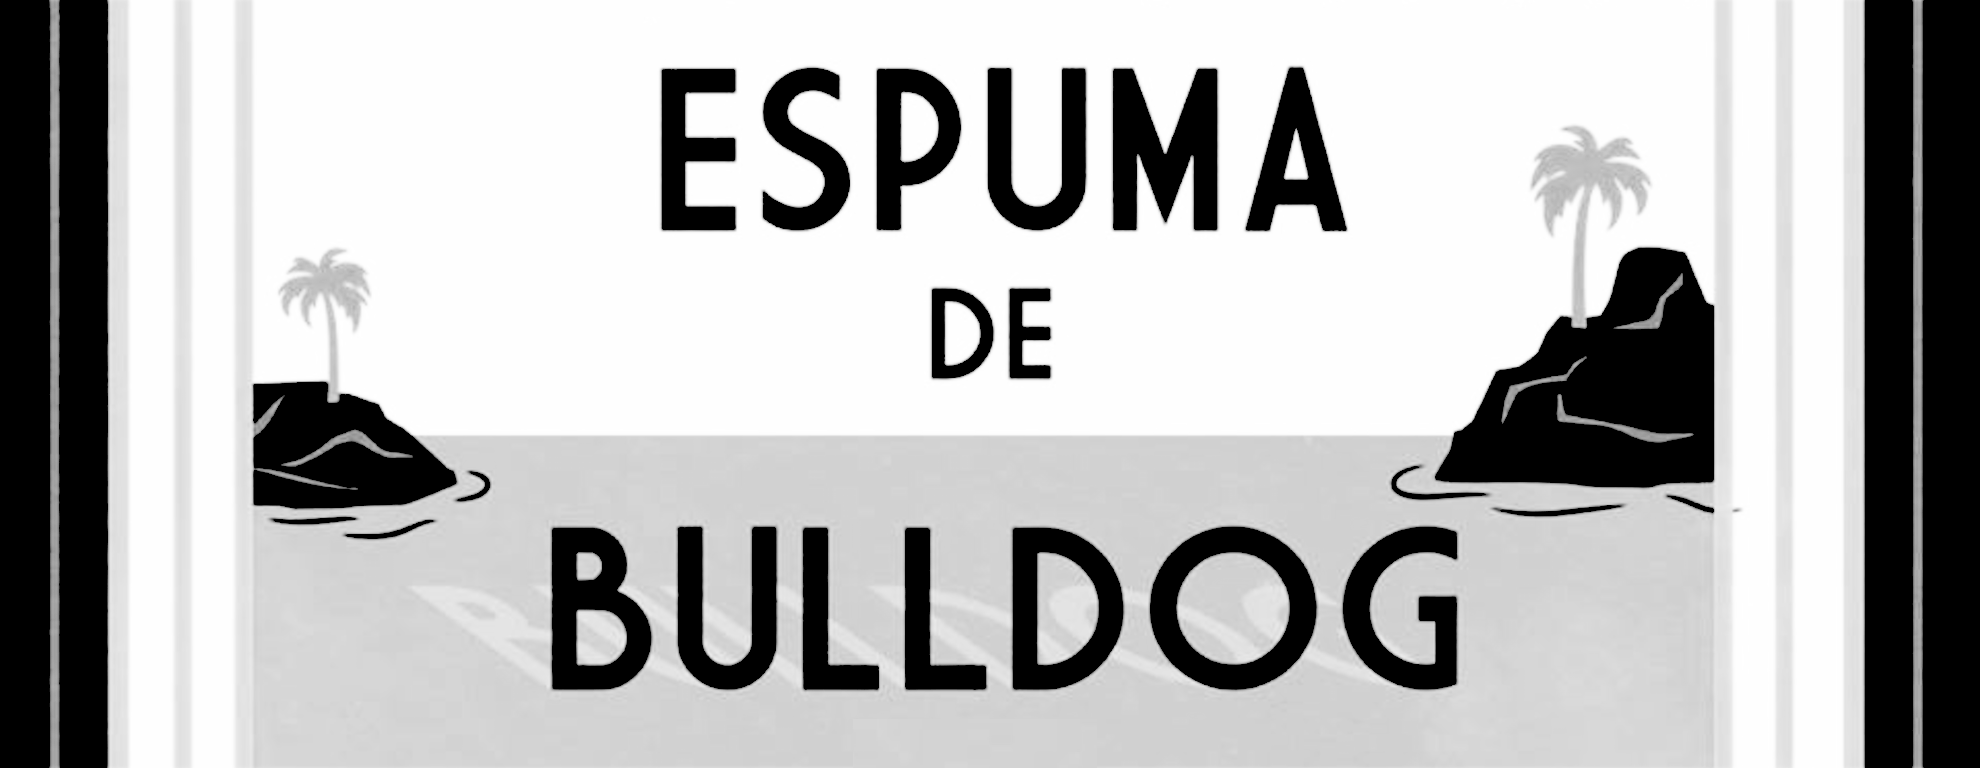 previsualizaciocc81n-espuma-de-bulldog1